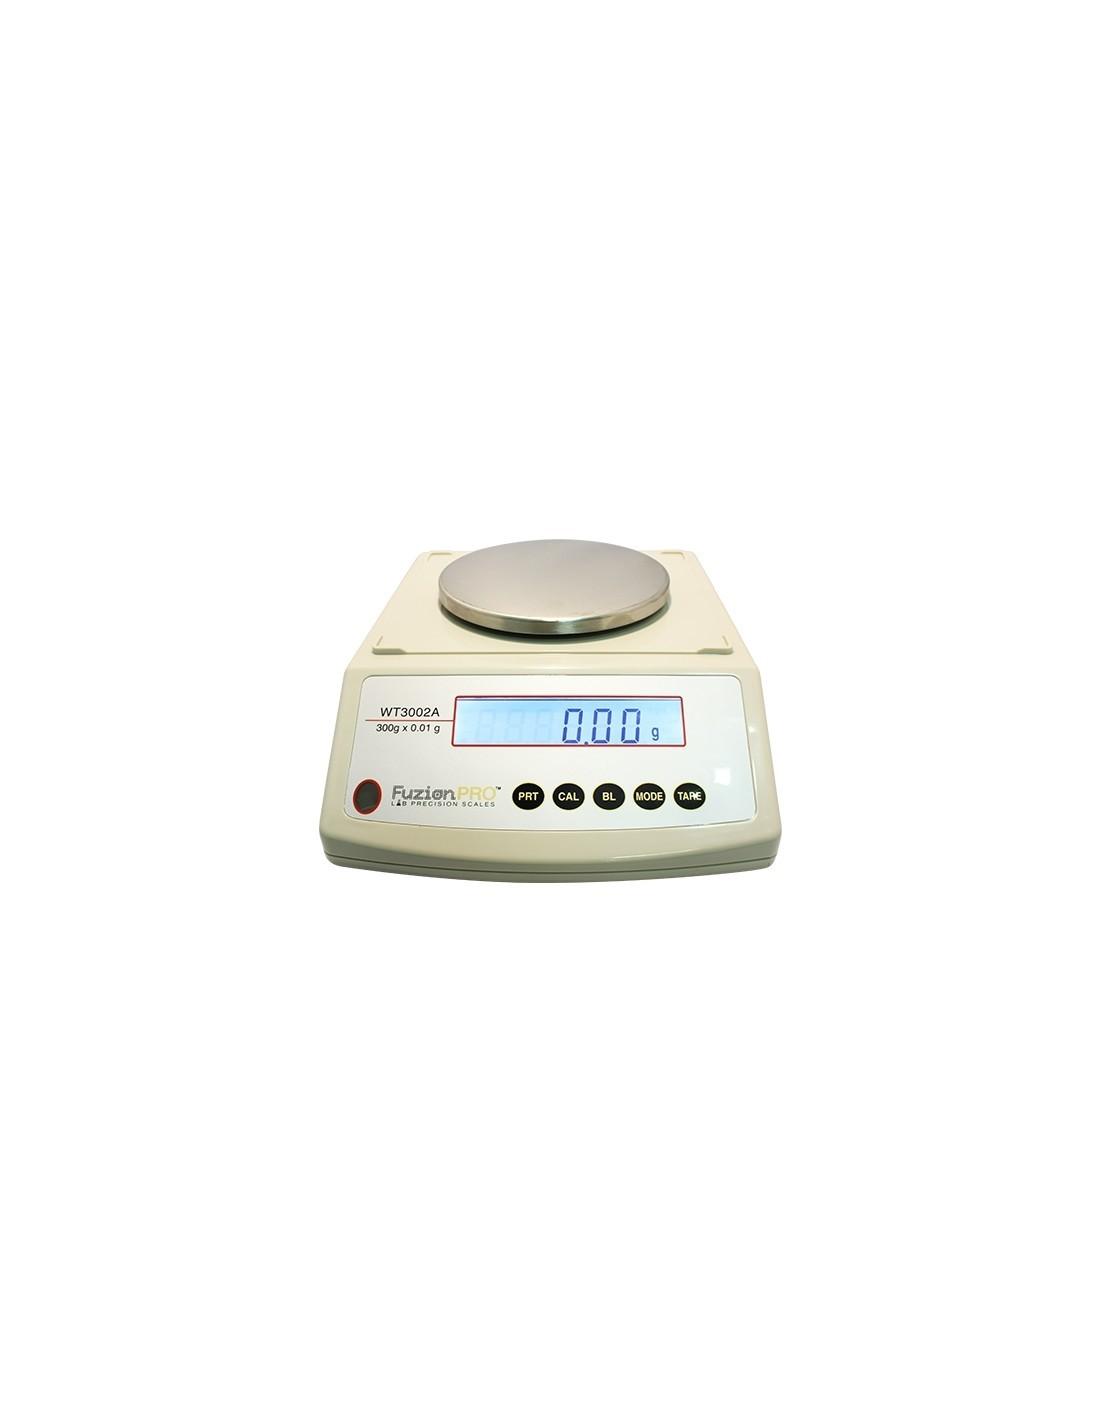 bascula-digital-precision-go-pro-300-0-01gr 2